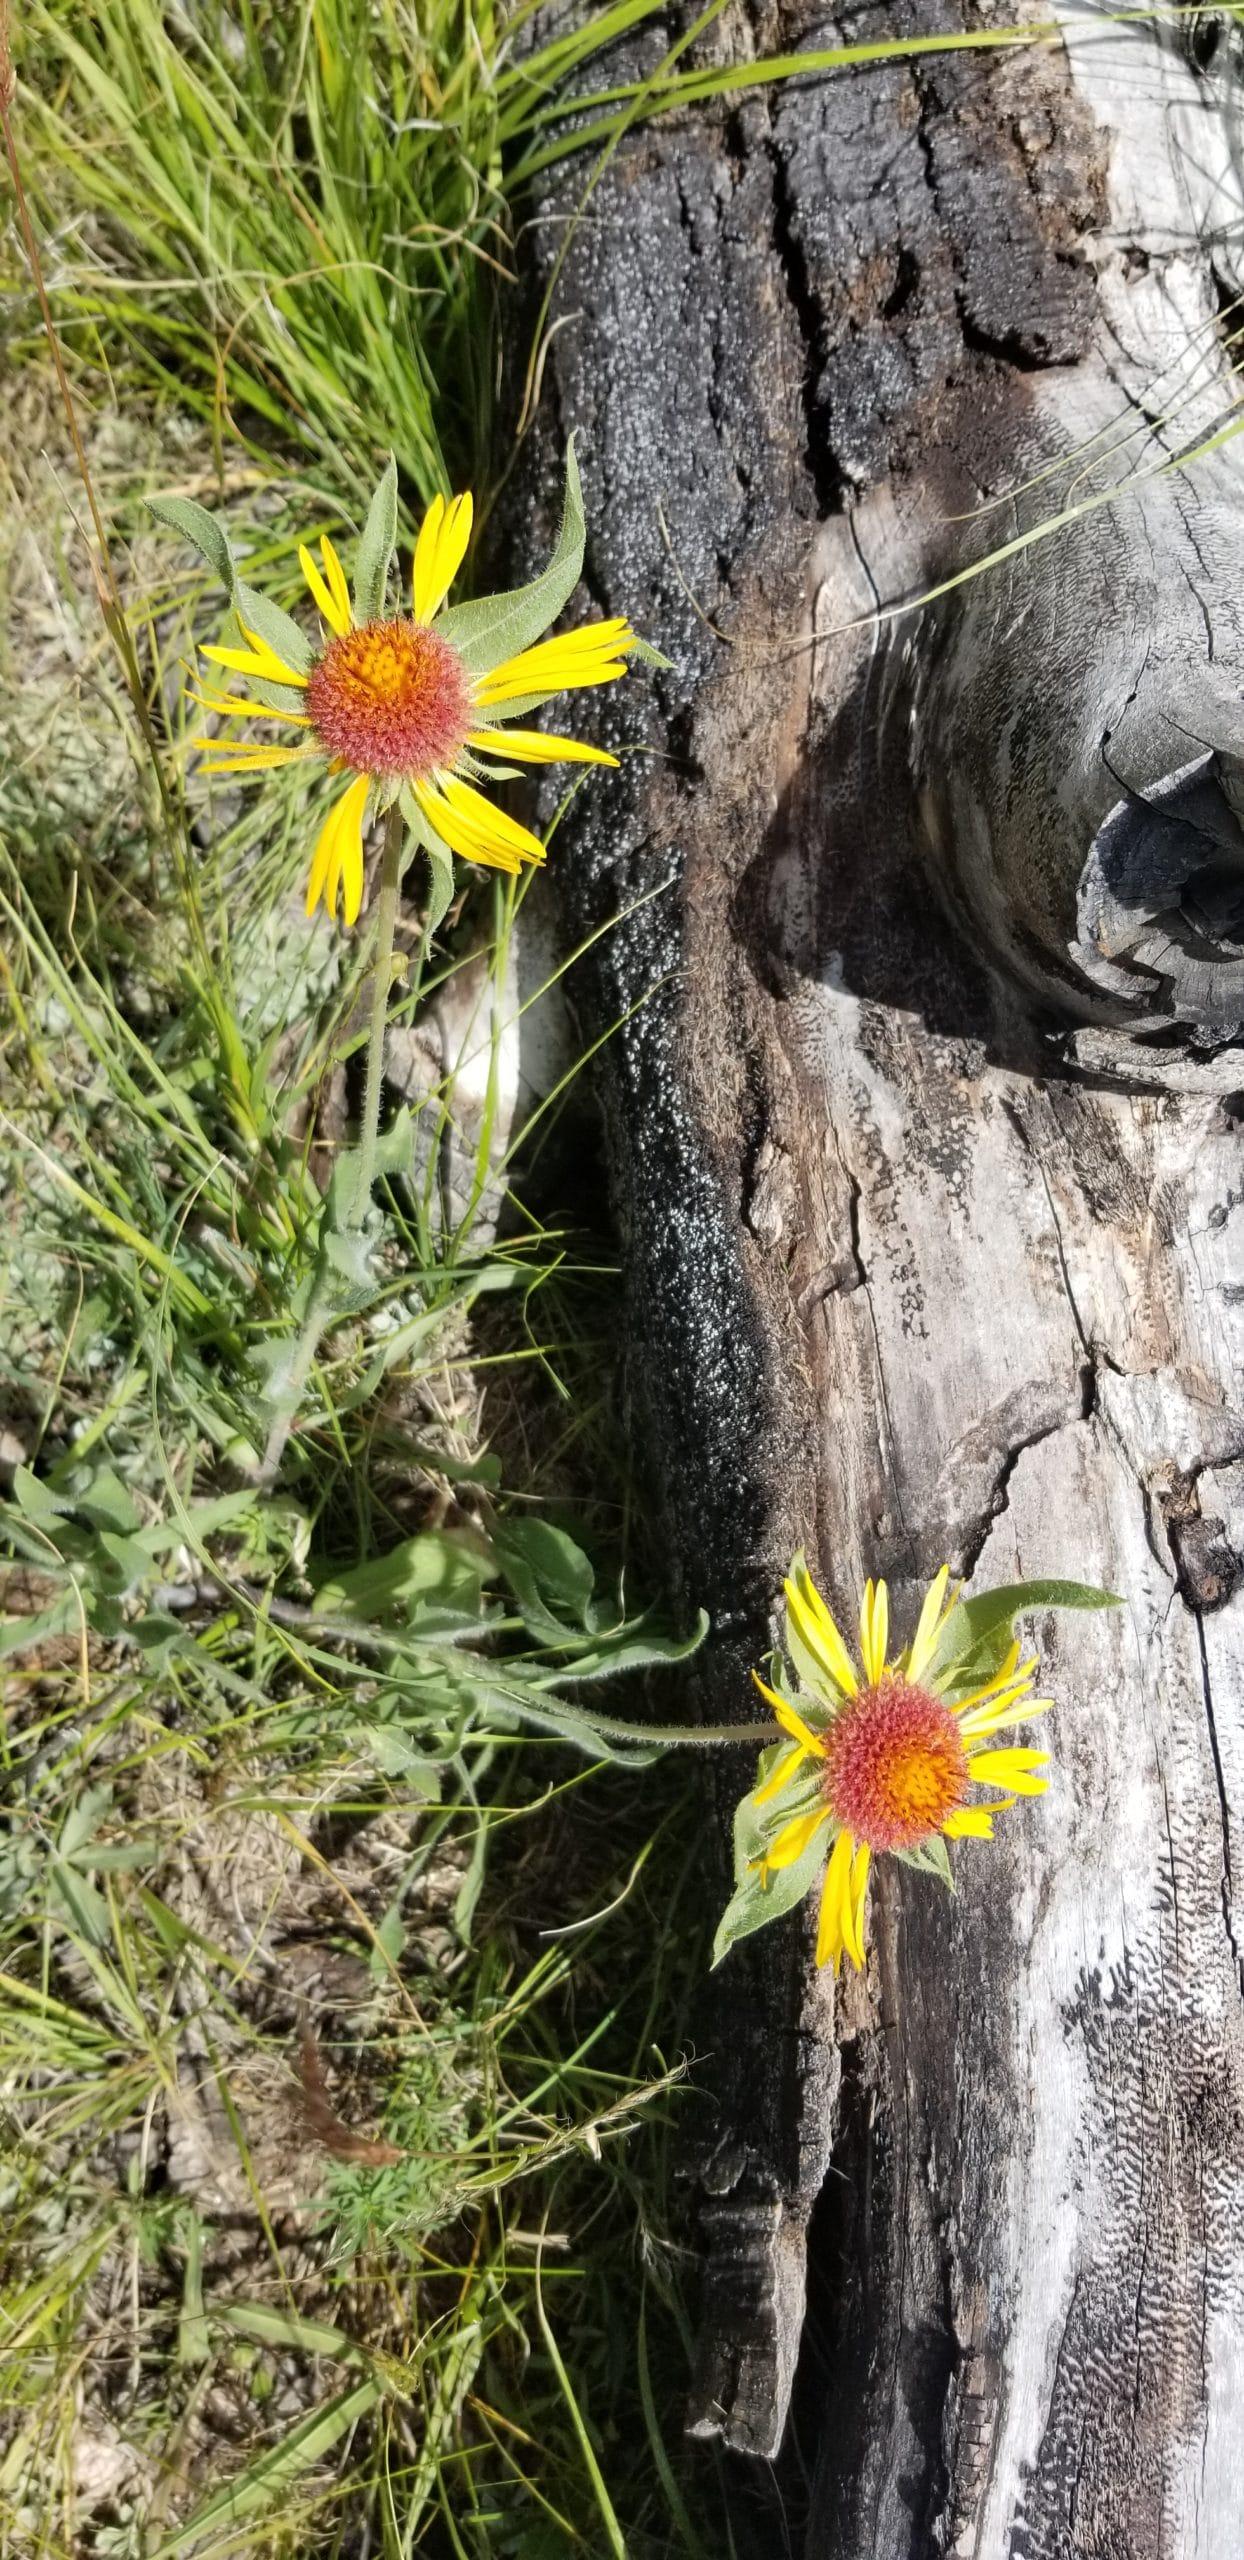 Flowers found on trail